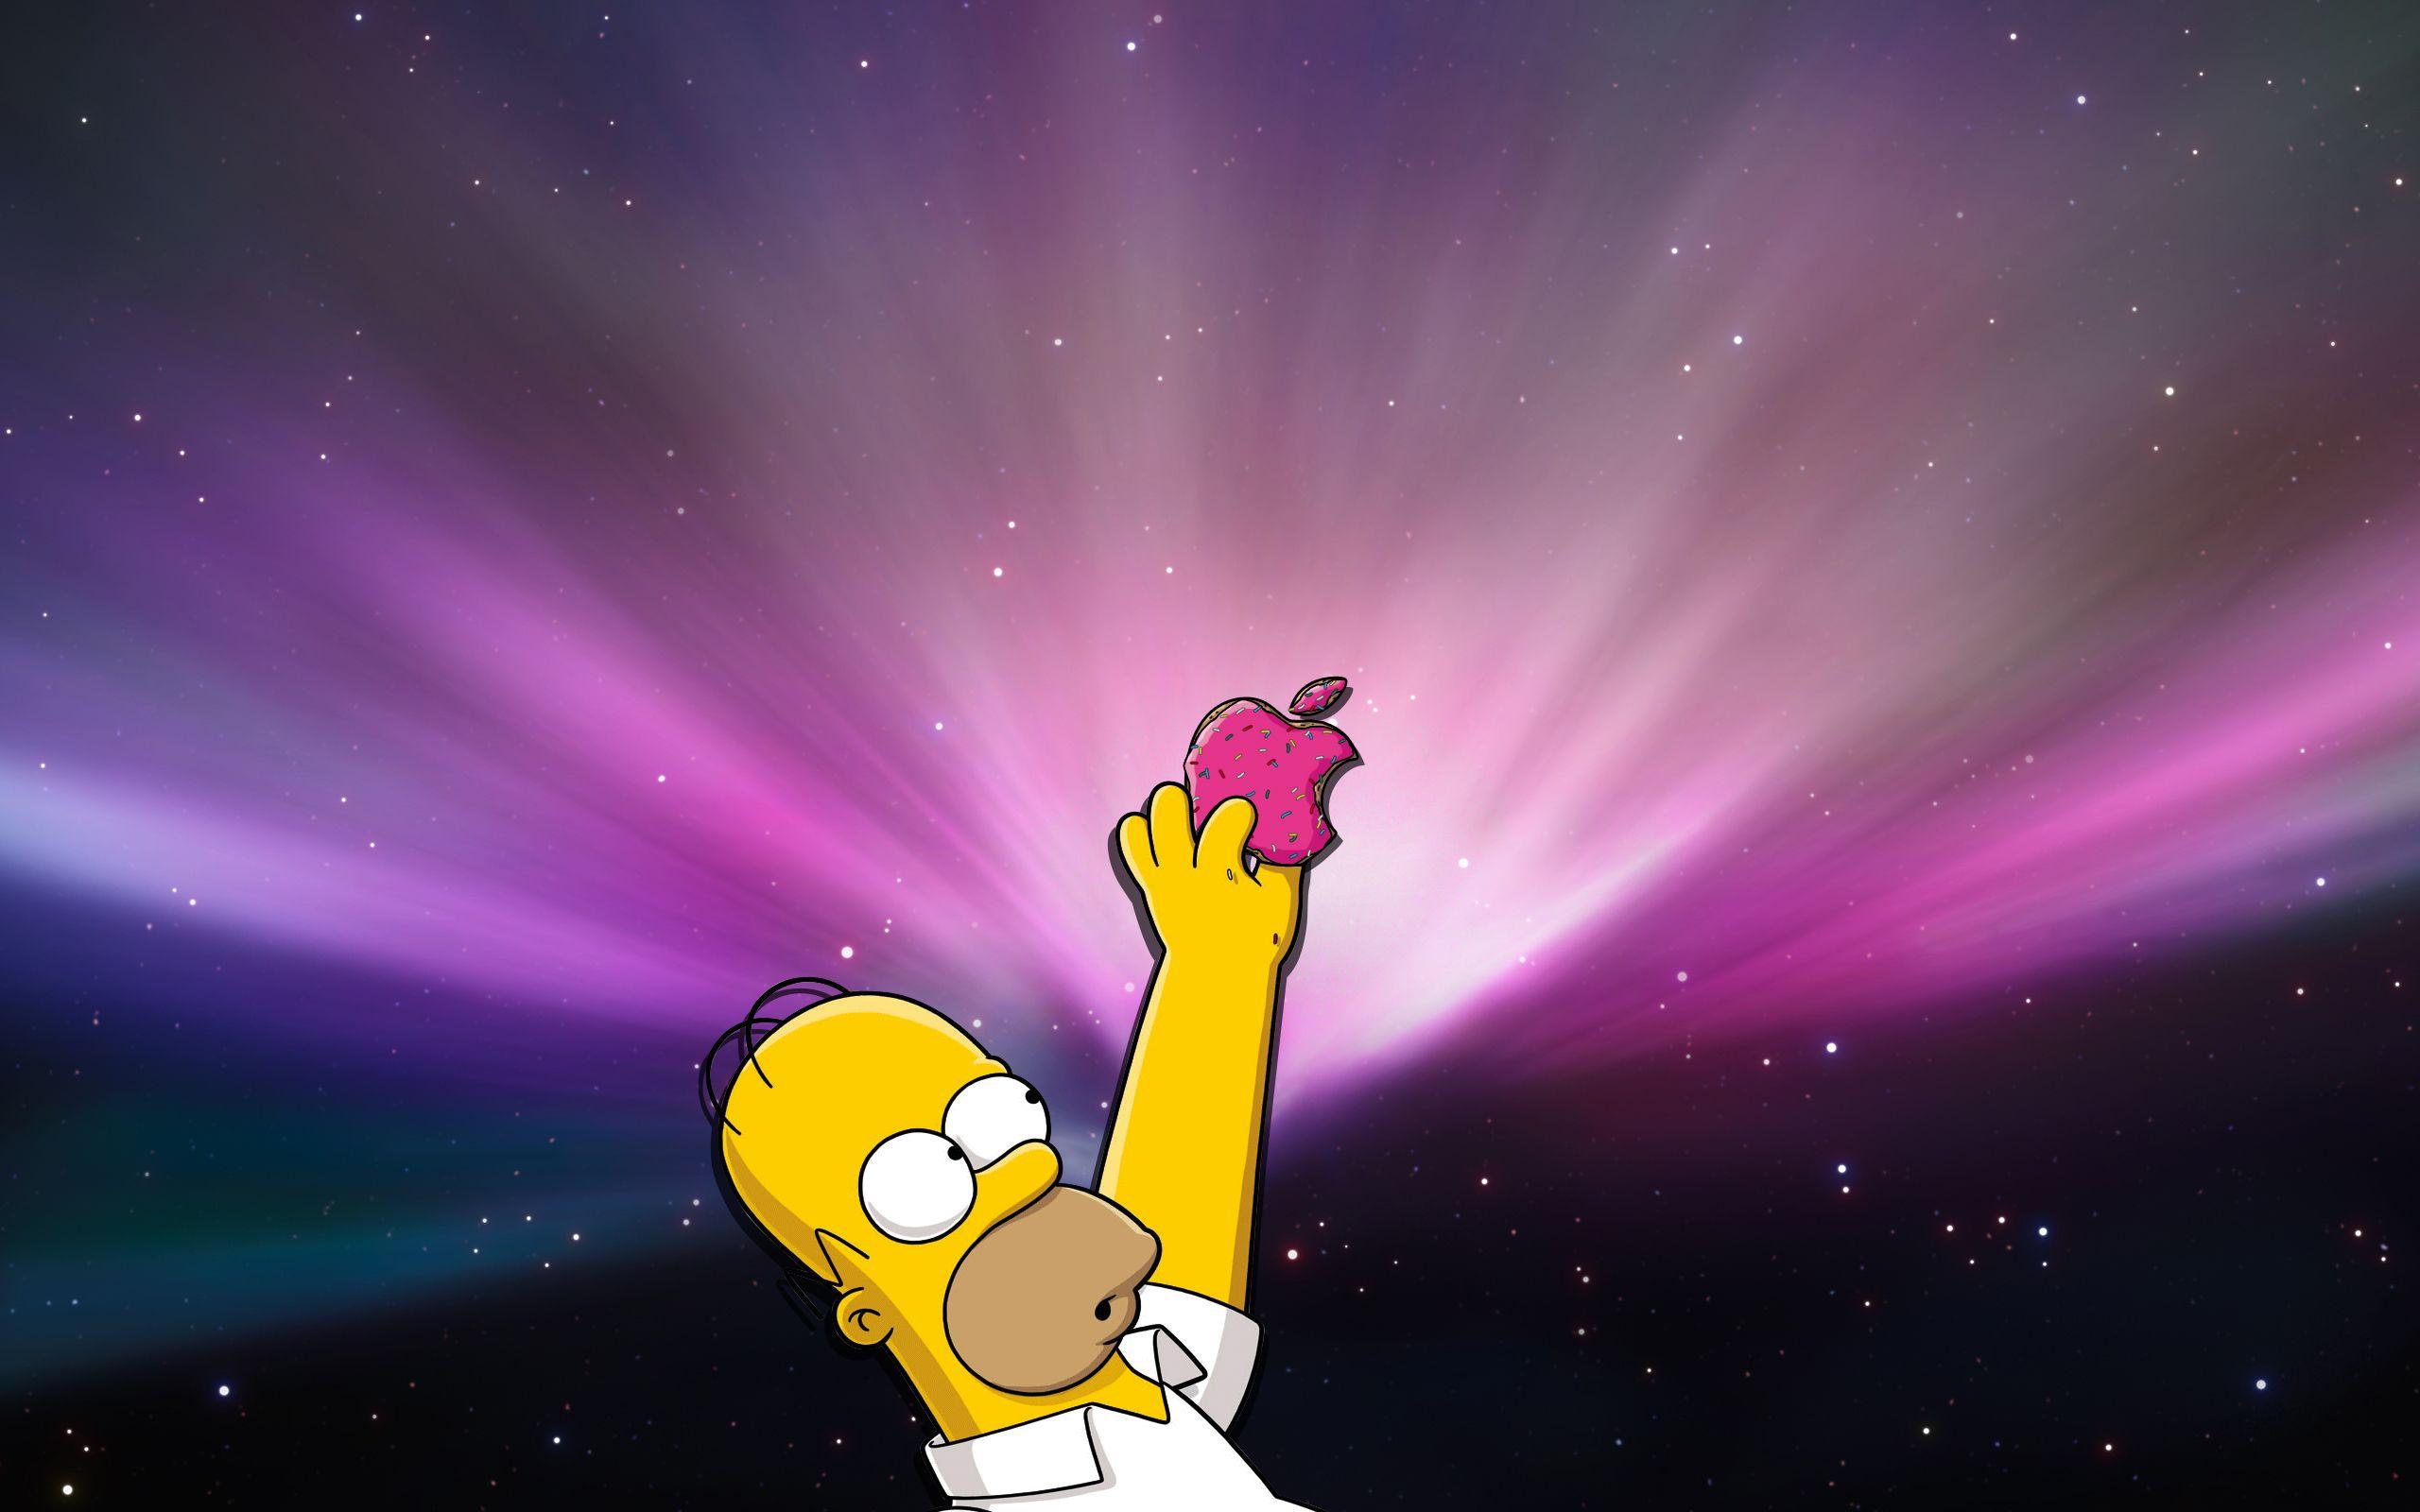 Homer Apple Simpsons WallPaper HD - http://imashon.com/w/